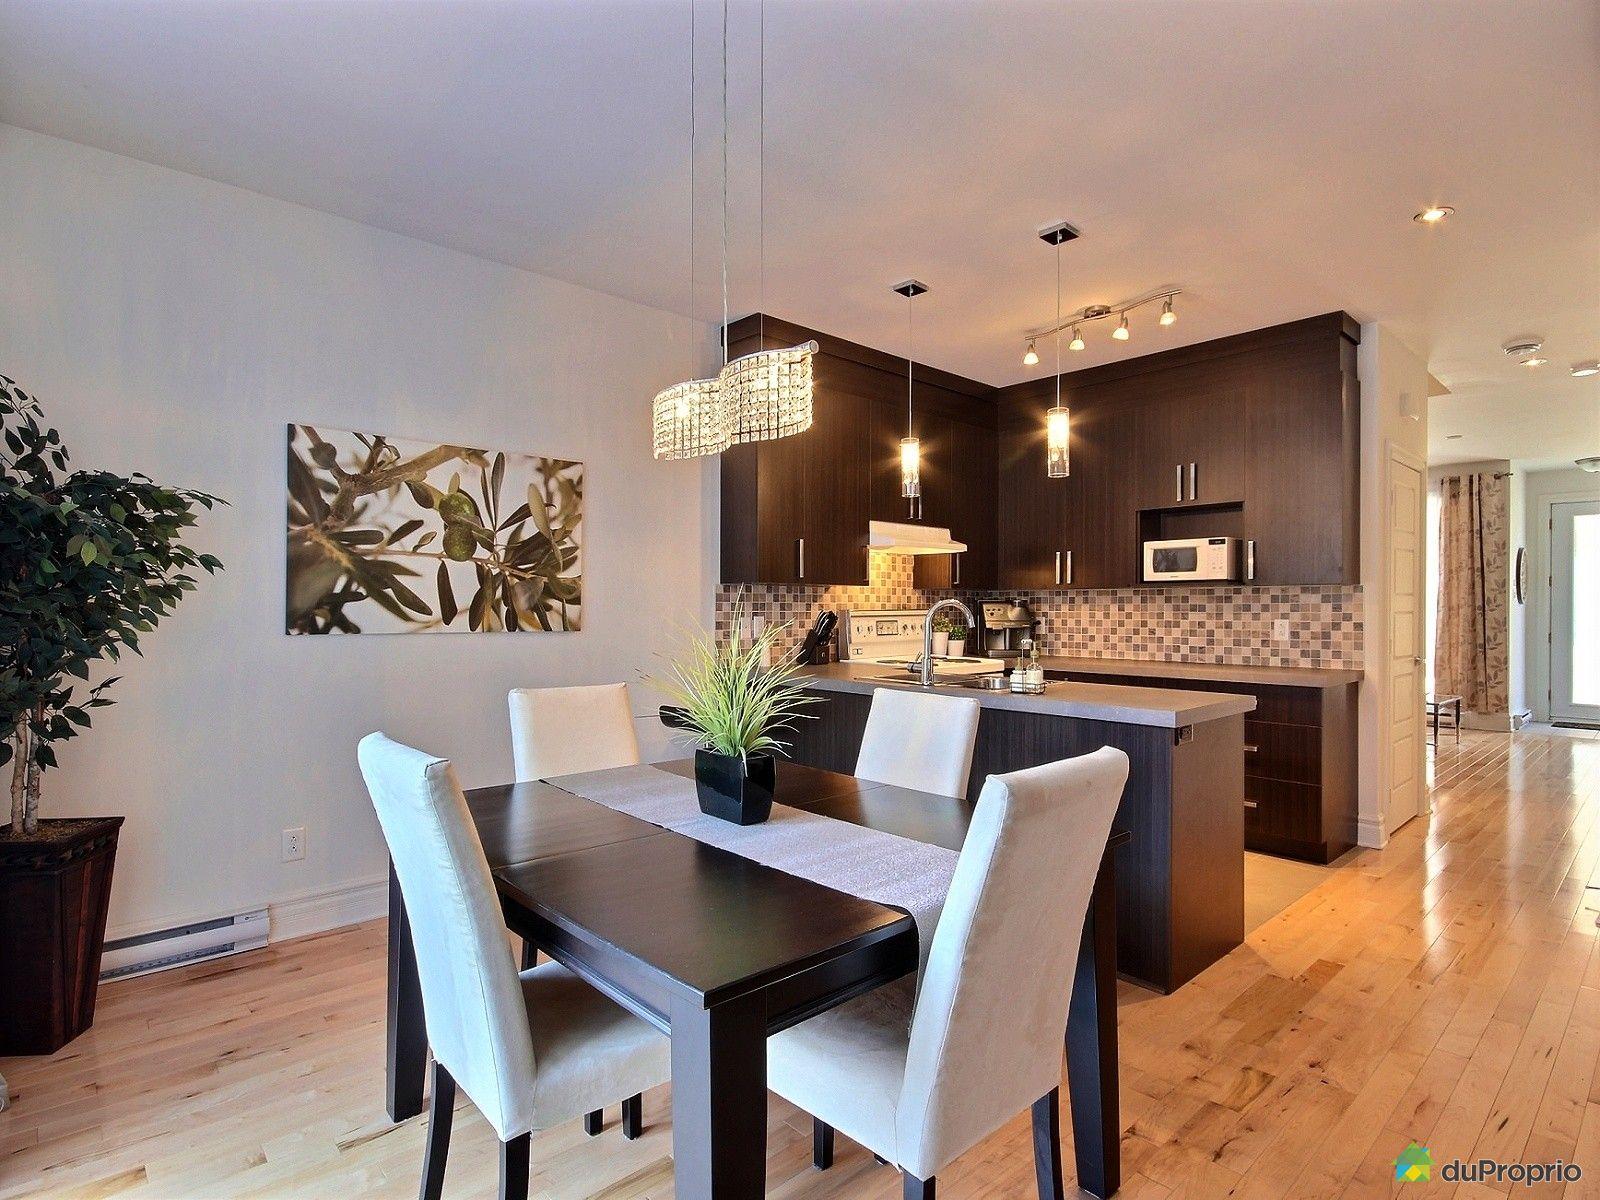 maison vendu montr al immobilier qu bec duproprio 496354. Black Bedroom Furniture Sets. Home Design Ideas